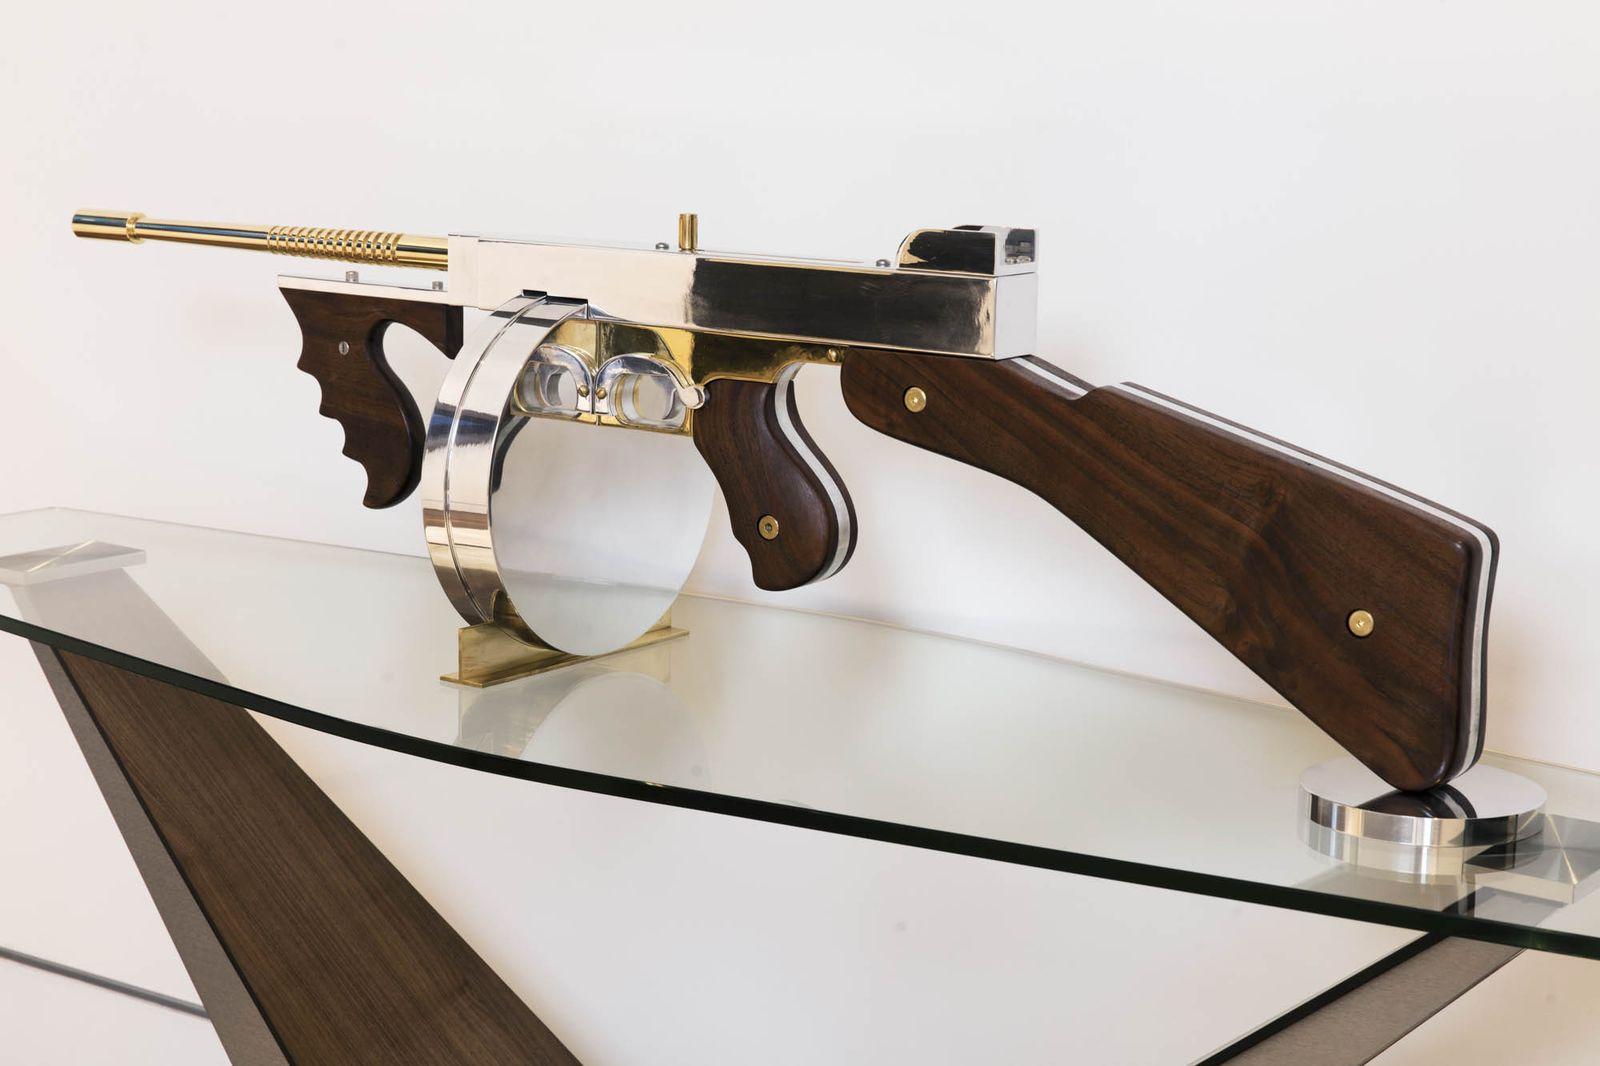 Bruce Makowsky's Machine Gun